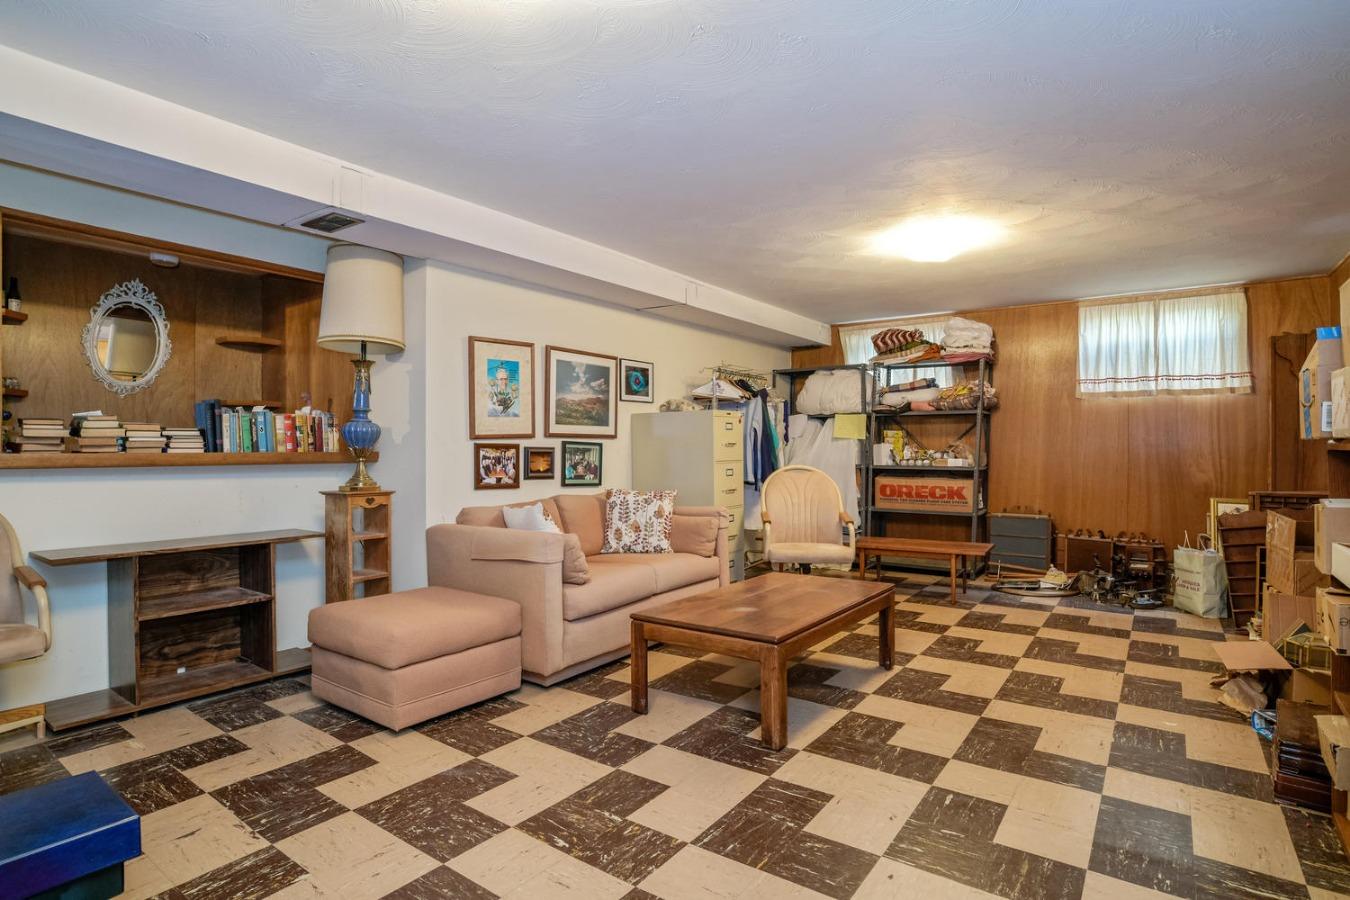 Spacious Retro 60's Family Room in Basement